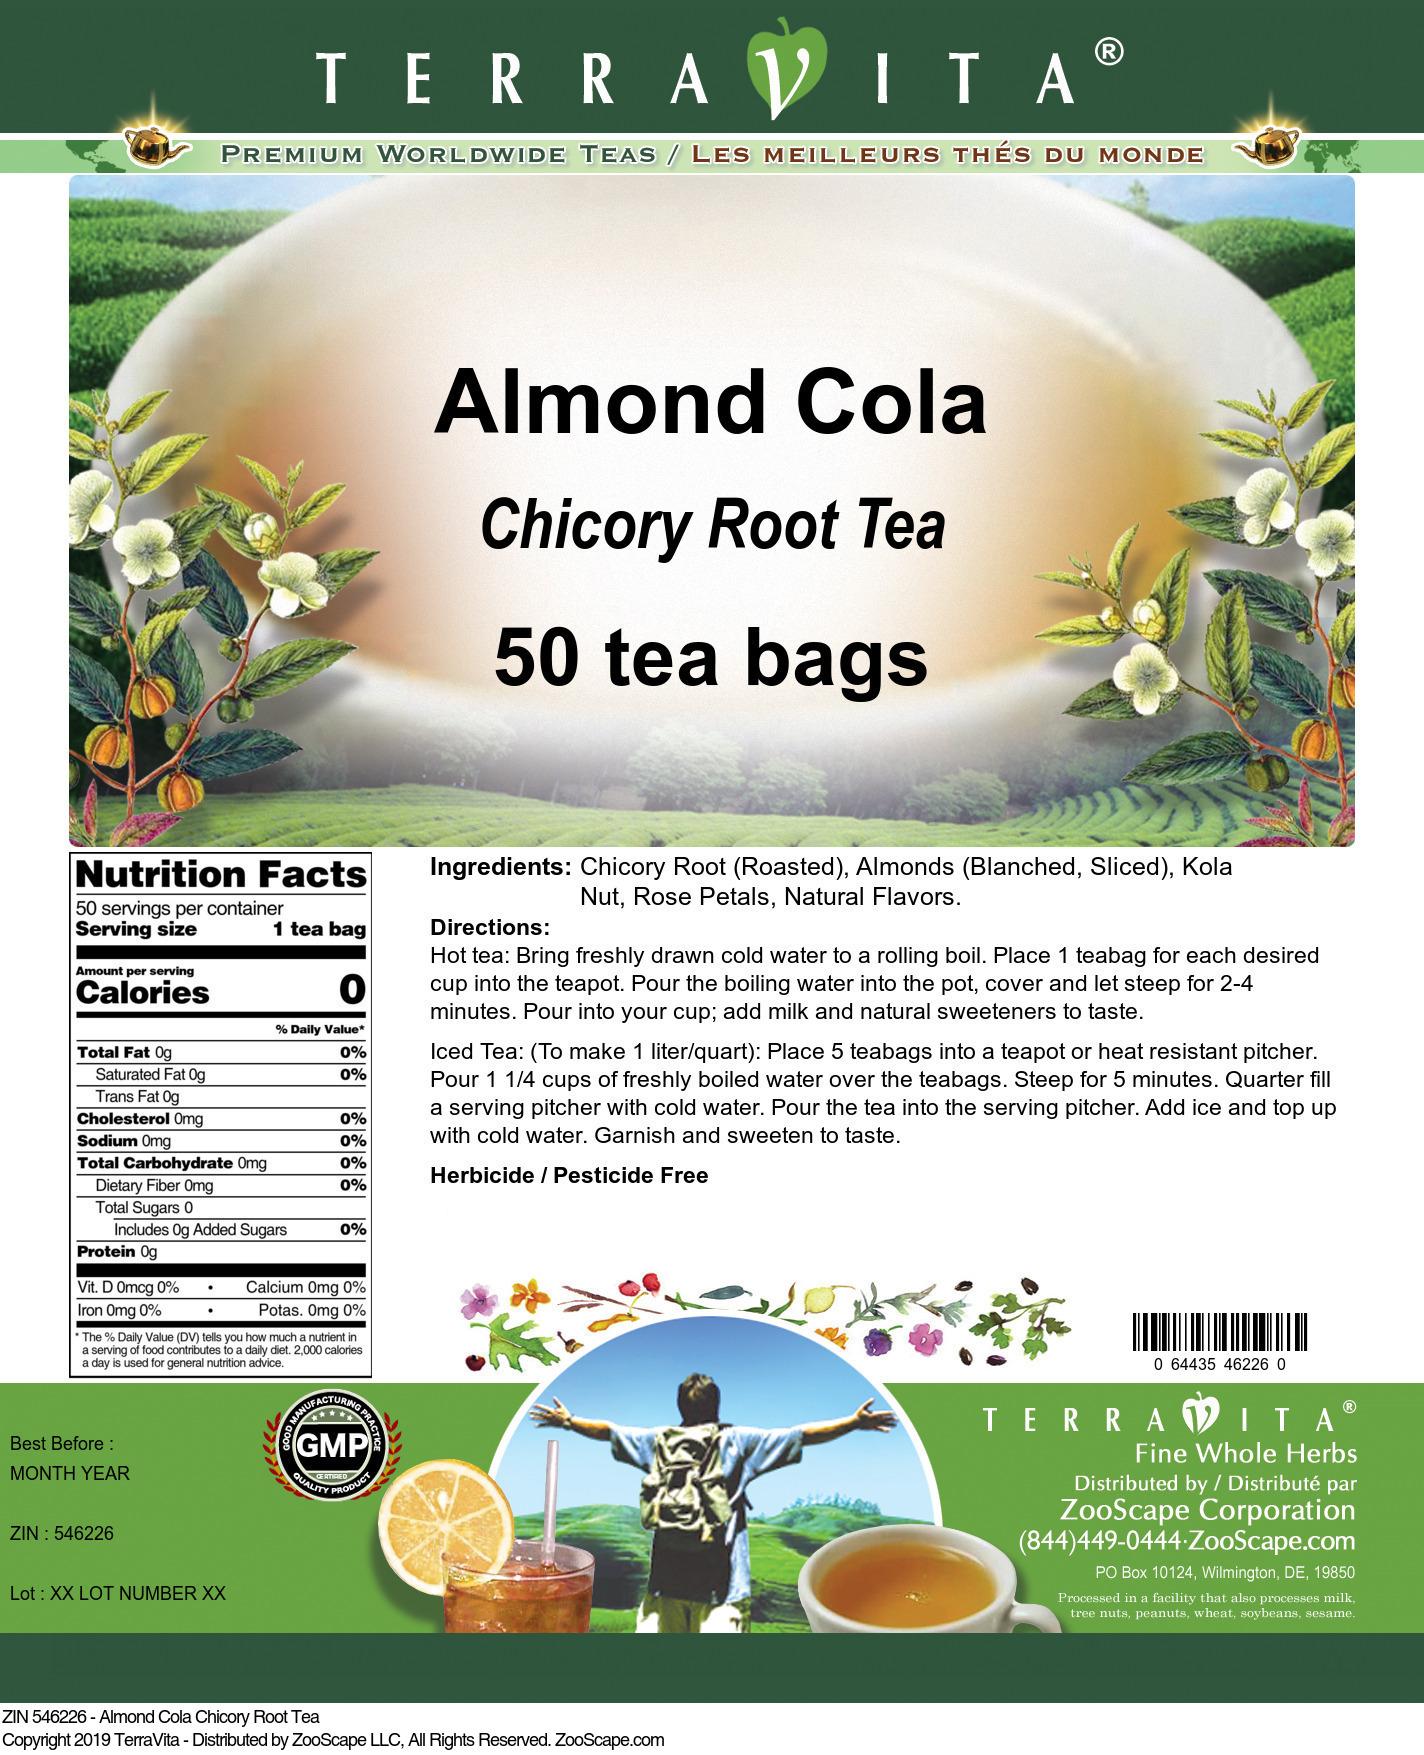 Almond Cola Chicory Root Tea